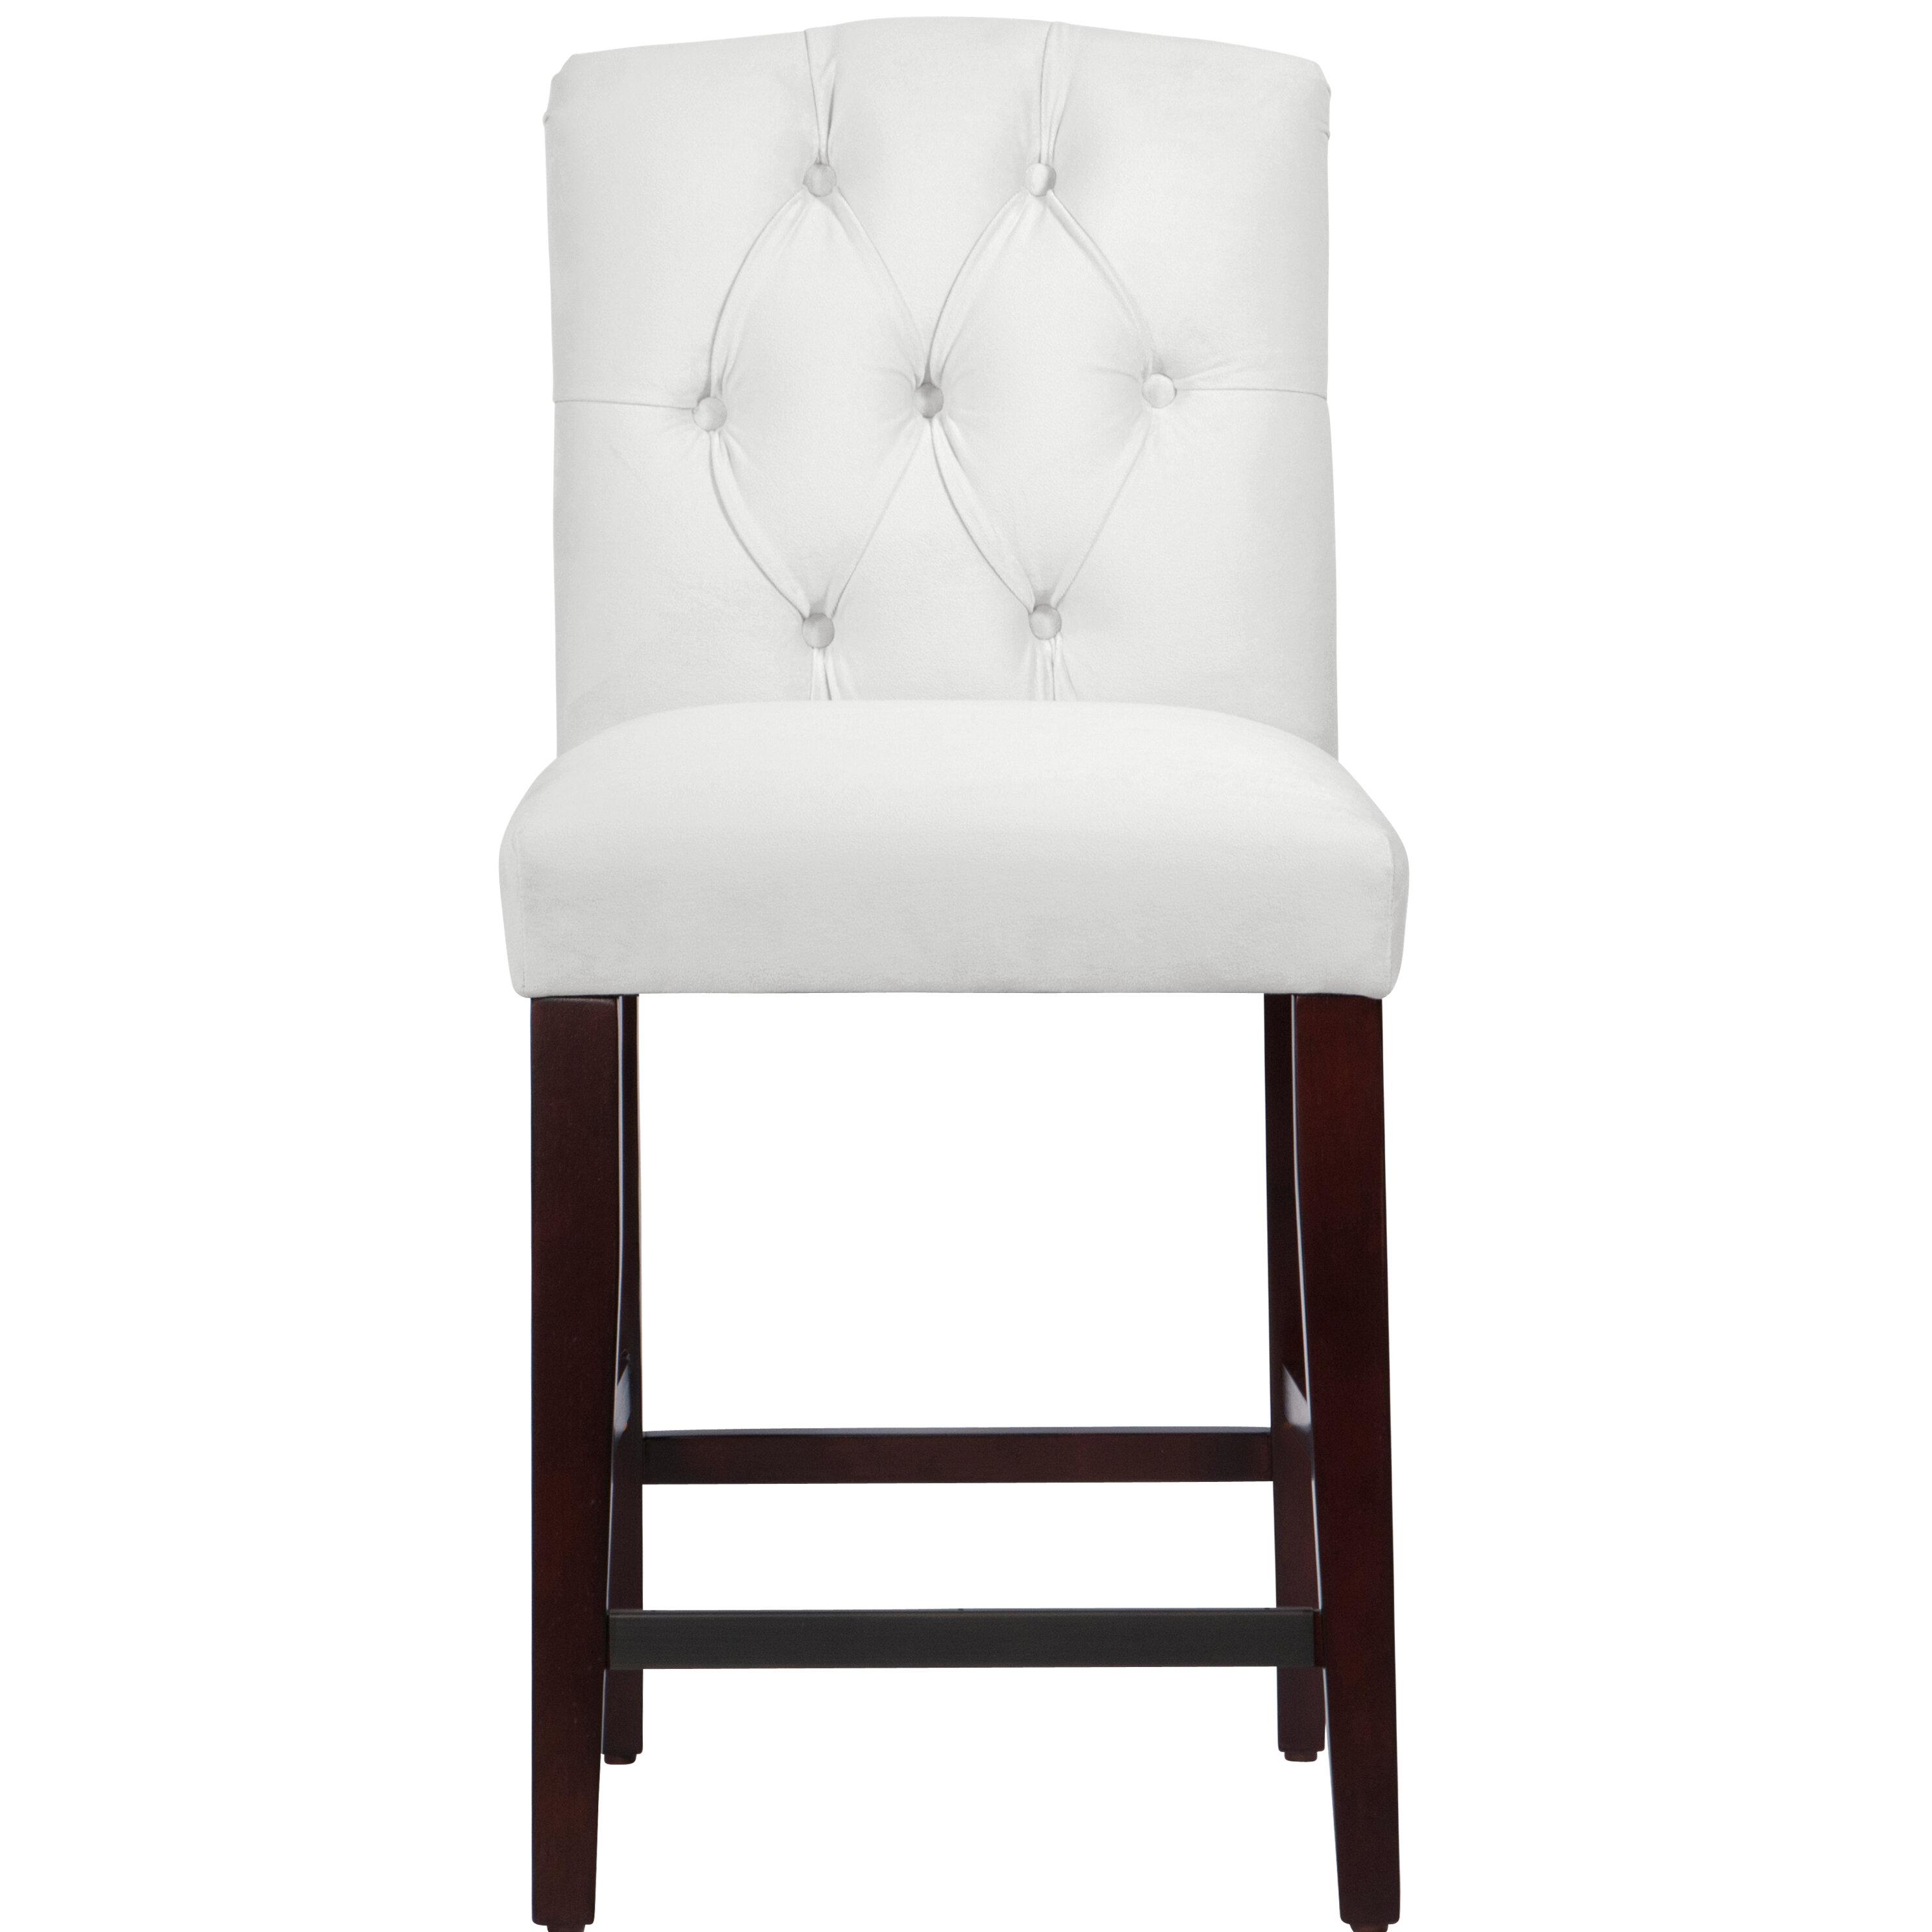 Darby home co cyrus tufted bar stool wayfair